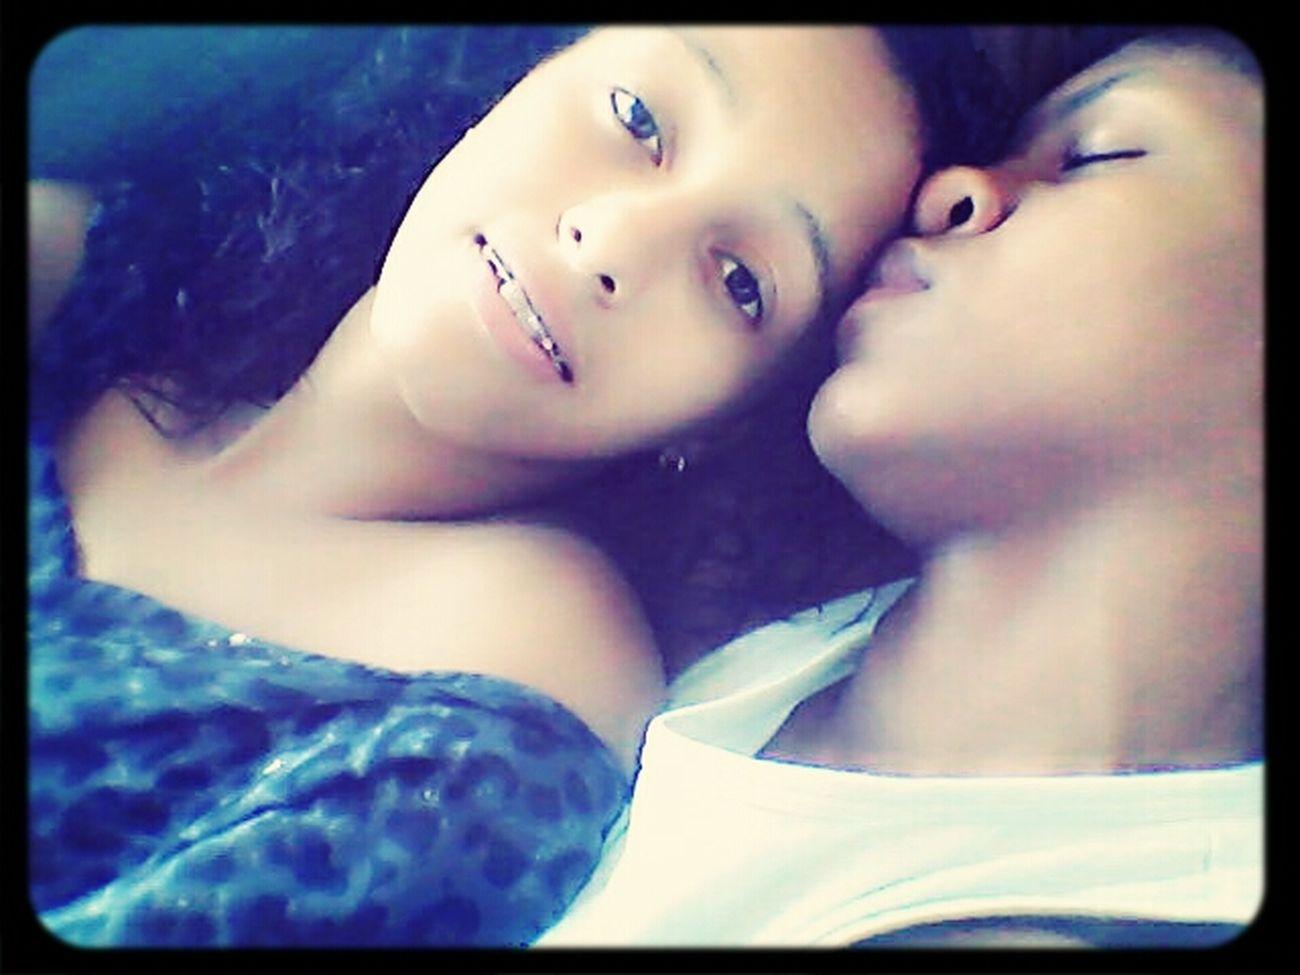 Amor ♔ ツ Love ♥ AmorIncondicional